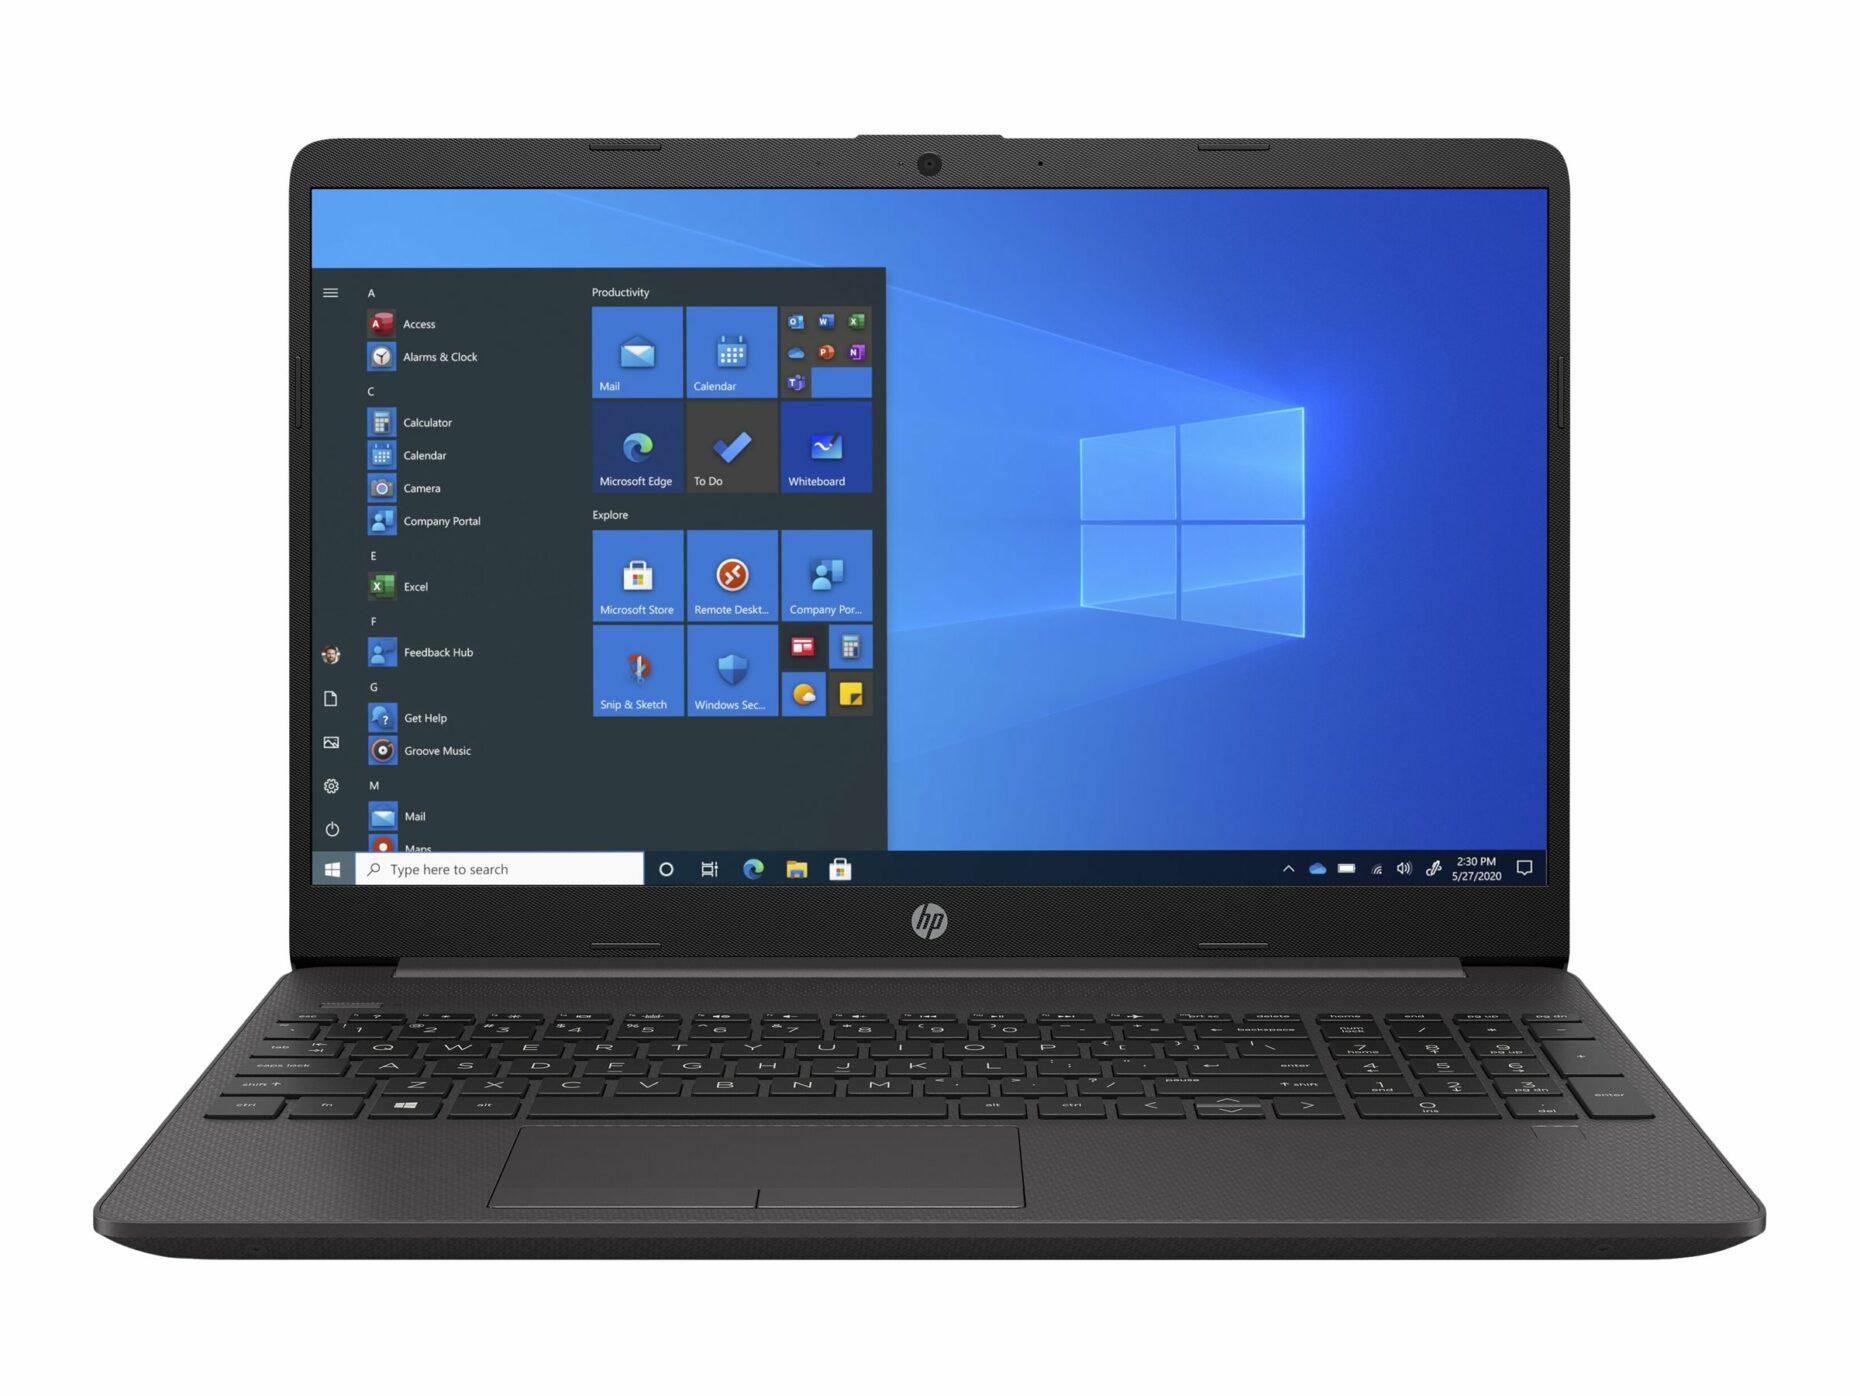 HP 255 G8 - Ryzen 5 3500U - Windows 10 Pro - 8 GB RAM - 256 GB SSD (Full HD) - Radeon Vega 8 - Notebook